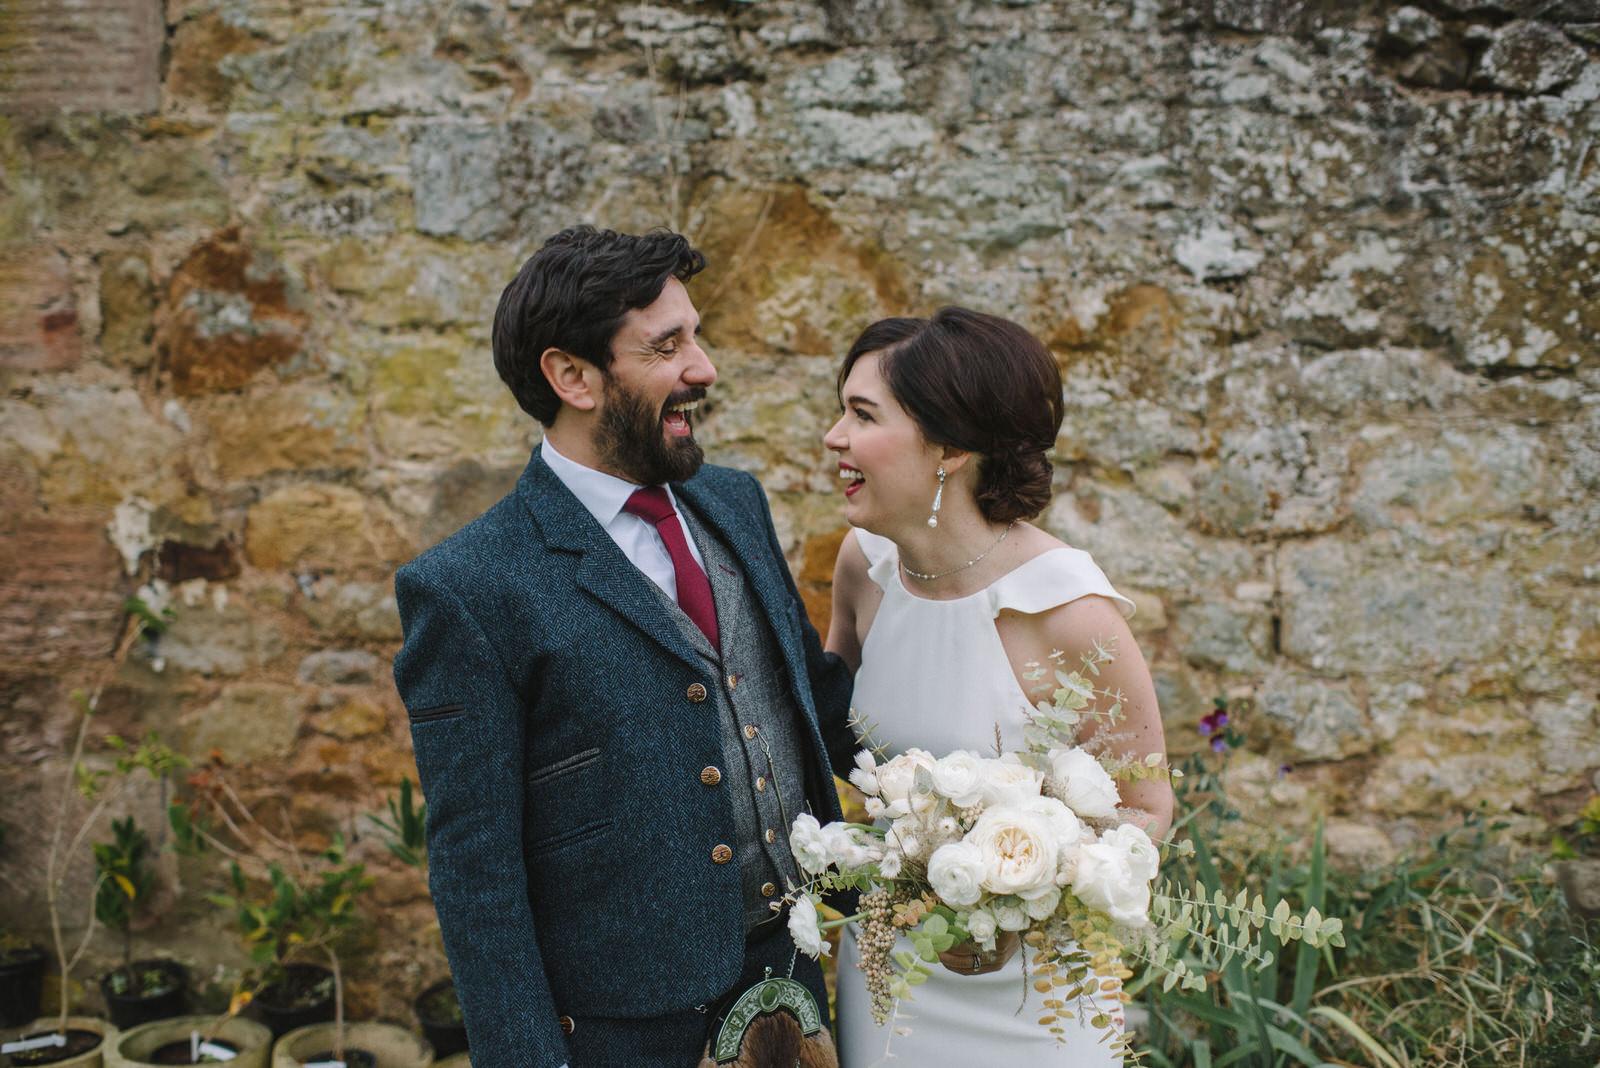 022-COLSTOUN-HOUSE-WEDDING-ALTERNATIVE-WEDDING-PHOTOGRAPHER-GLASGOW-WEDDING-PHOTOGRAPHER-STYLISH-SCOTTISH-WEDDING.JPG